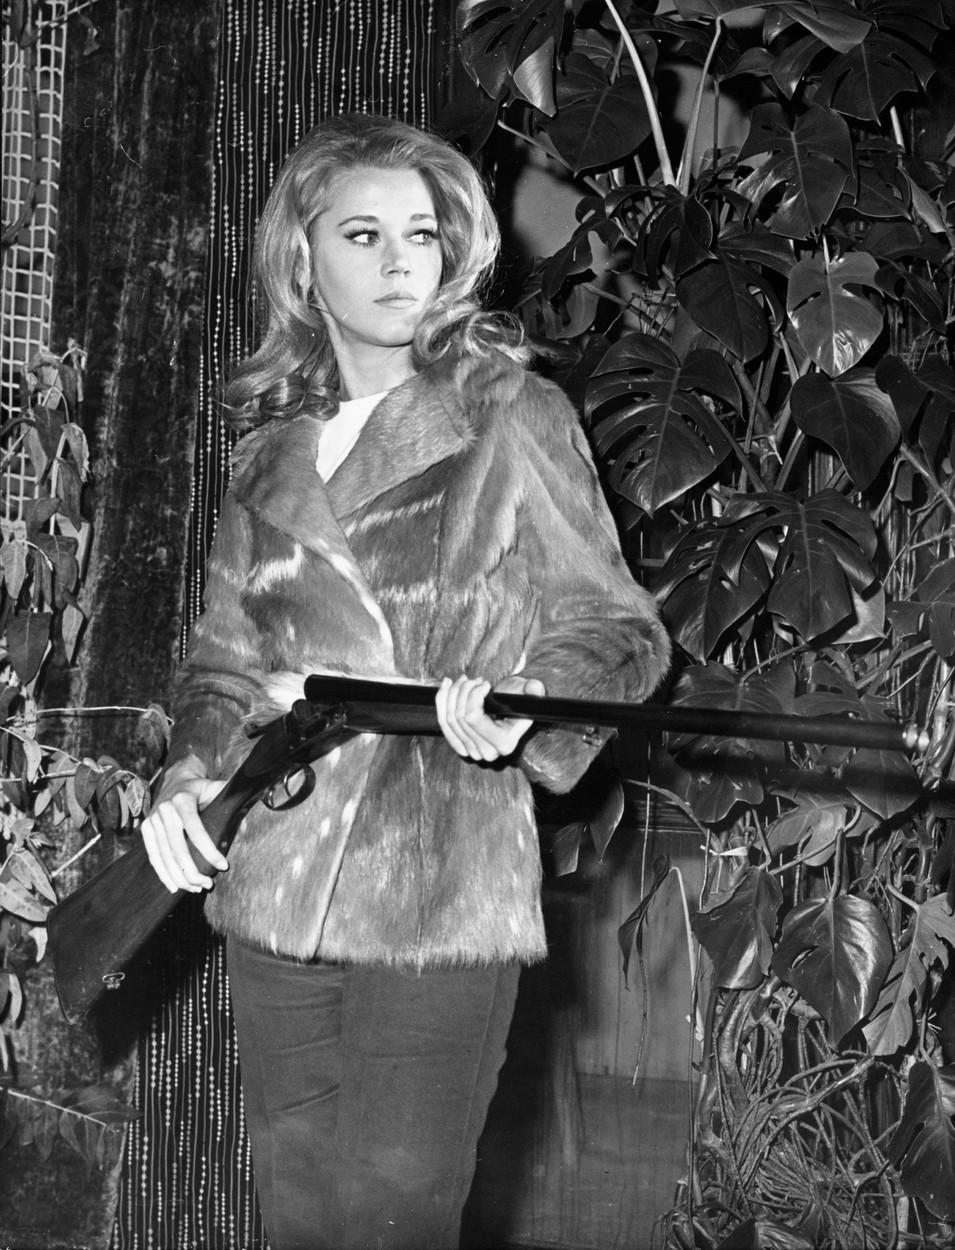 Jan 25, 1966; Paris, FRANCE; Actress JANE FONDA in 'La Curee'.,Image: 210167131, License: Rights-managed, Restrictions: , Model Release: no, Credit line: KEYSTONE Pictures USA / Zuma Press / Profimedia